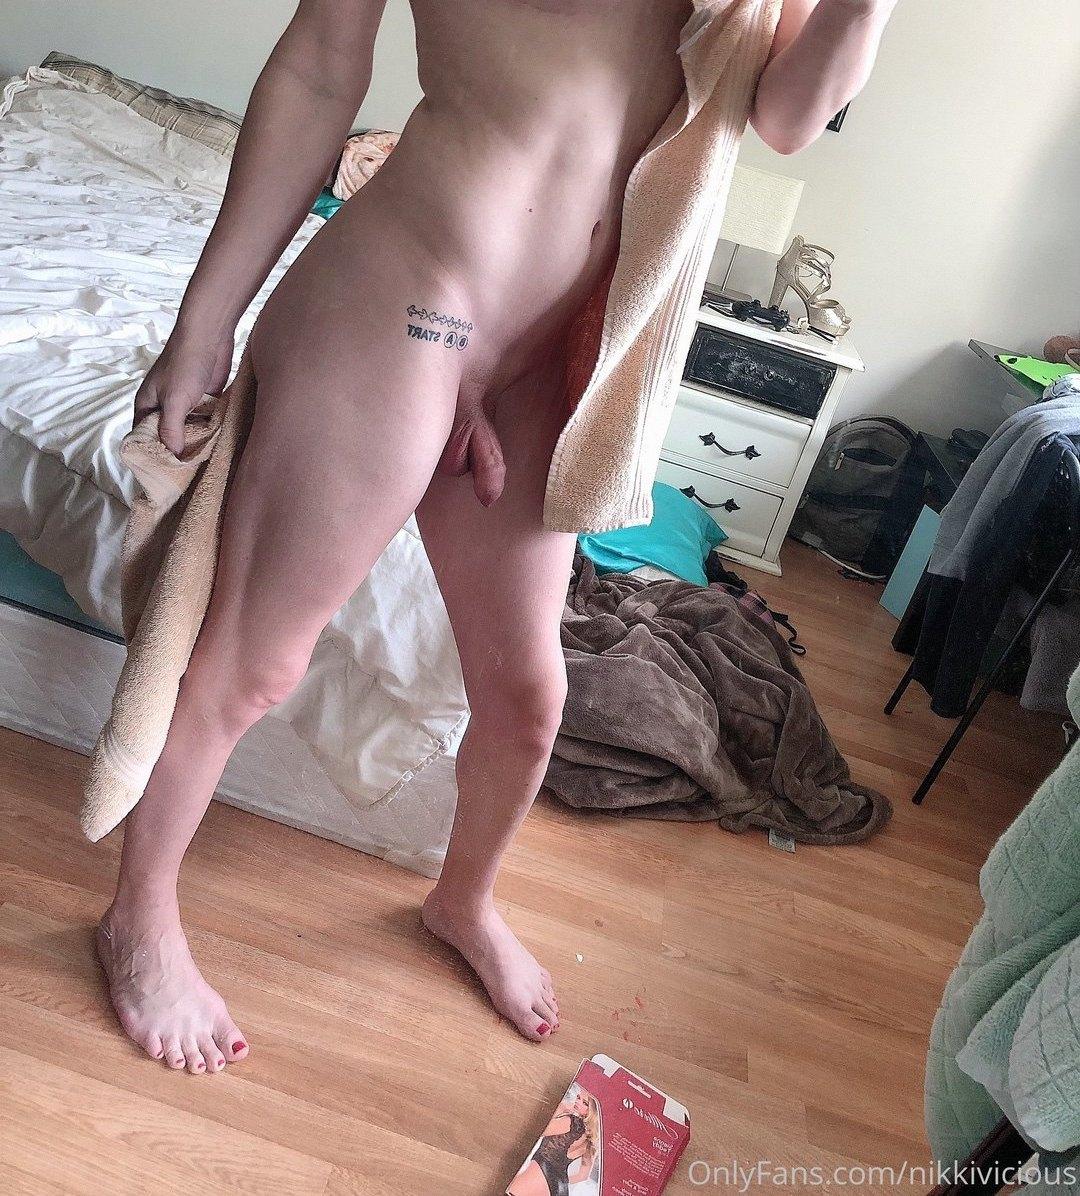 [ts] Nikki Vicious Aka Nikkivicious Onlyfans Nudes Leaks 0024